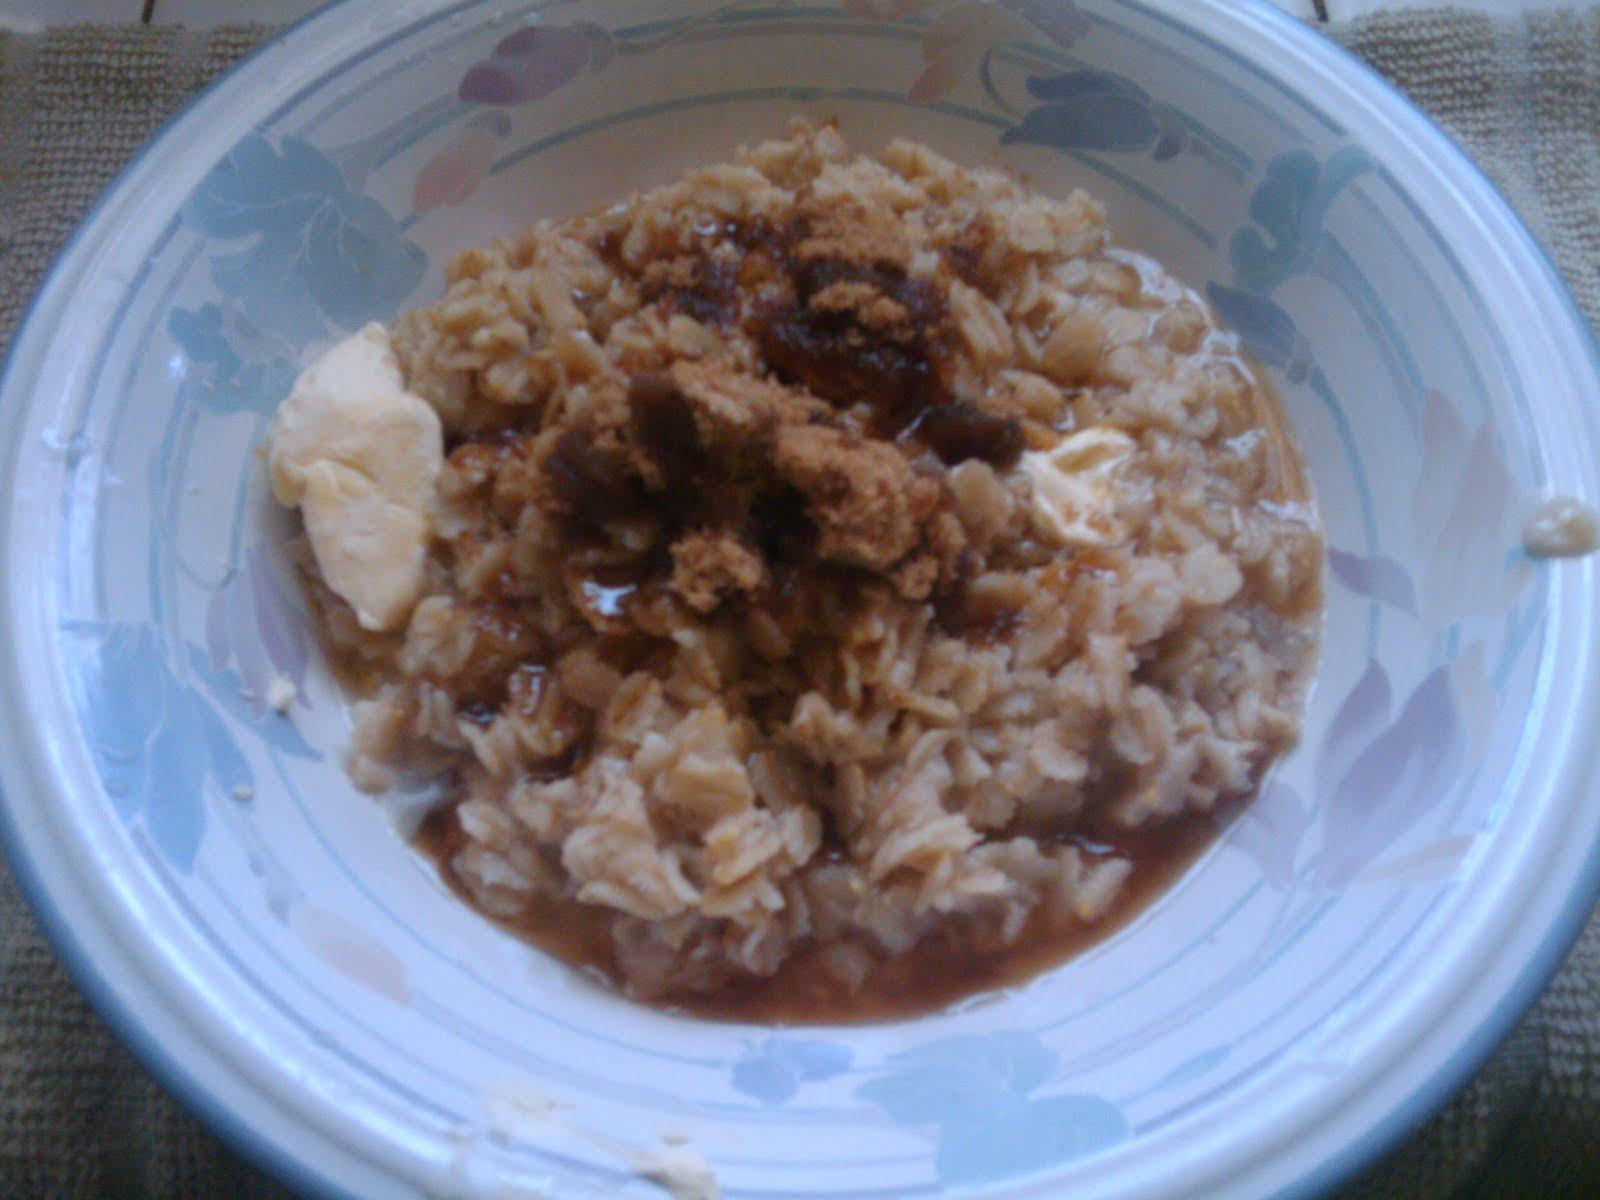 Brown+Sugar+and+Maple+Oatmeal.jpg